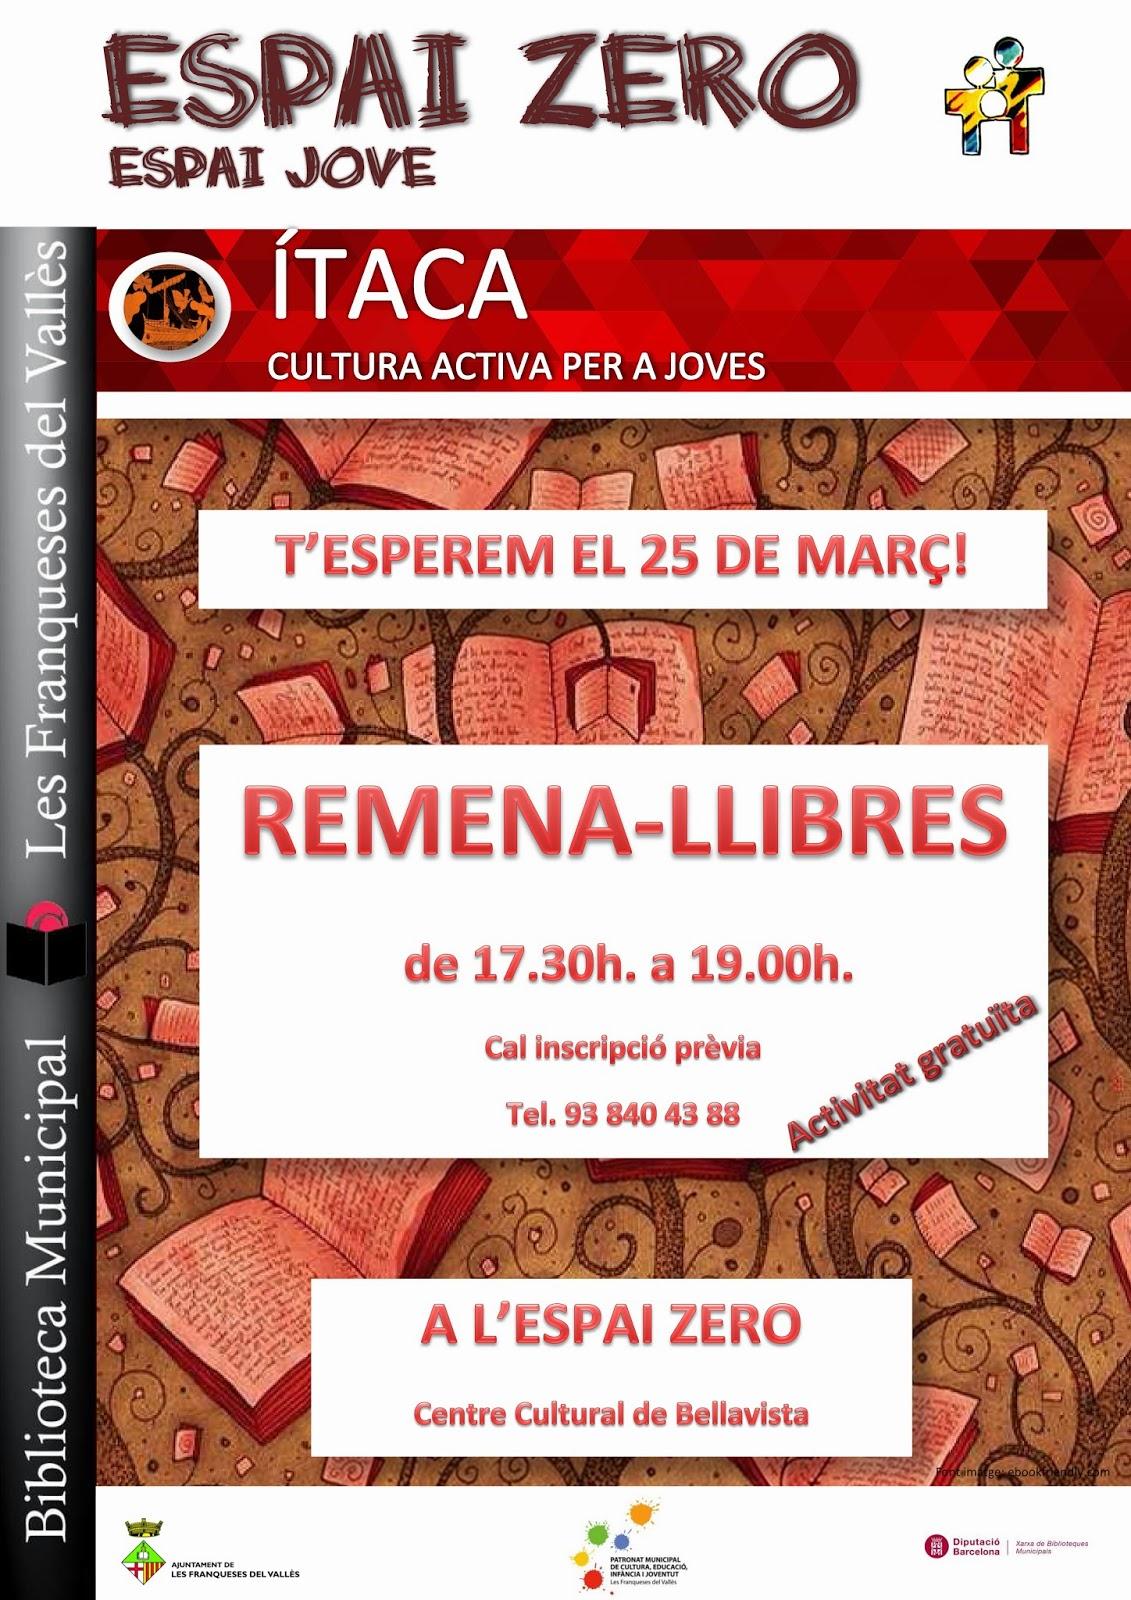 http://www.lesfranqueses.cat/actualitat/agenda/2015/03/25/espai-zero-itaca-remena-llibres-literatura-de-memories